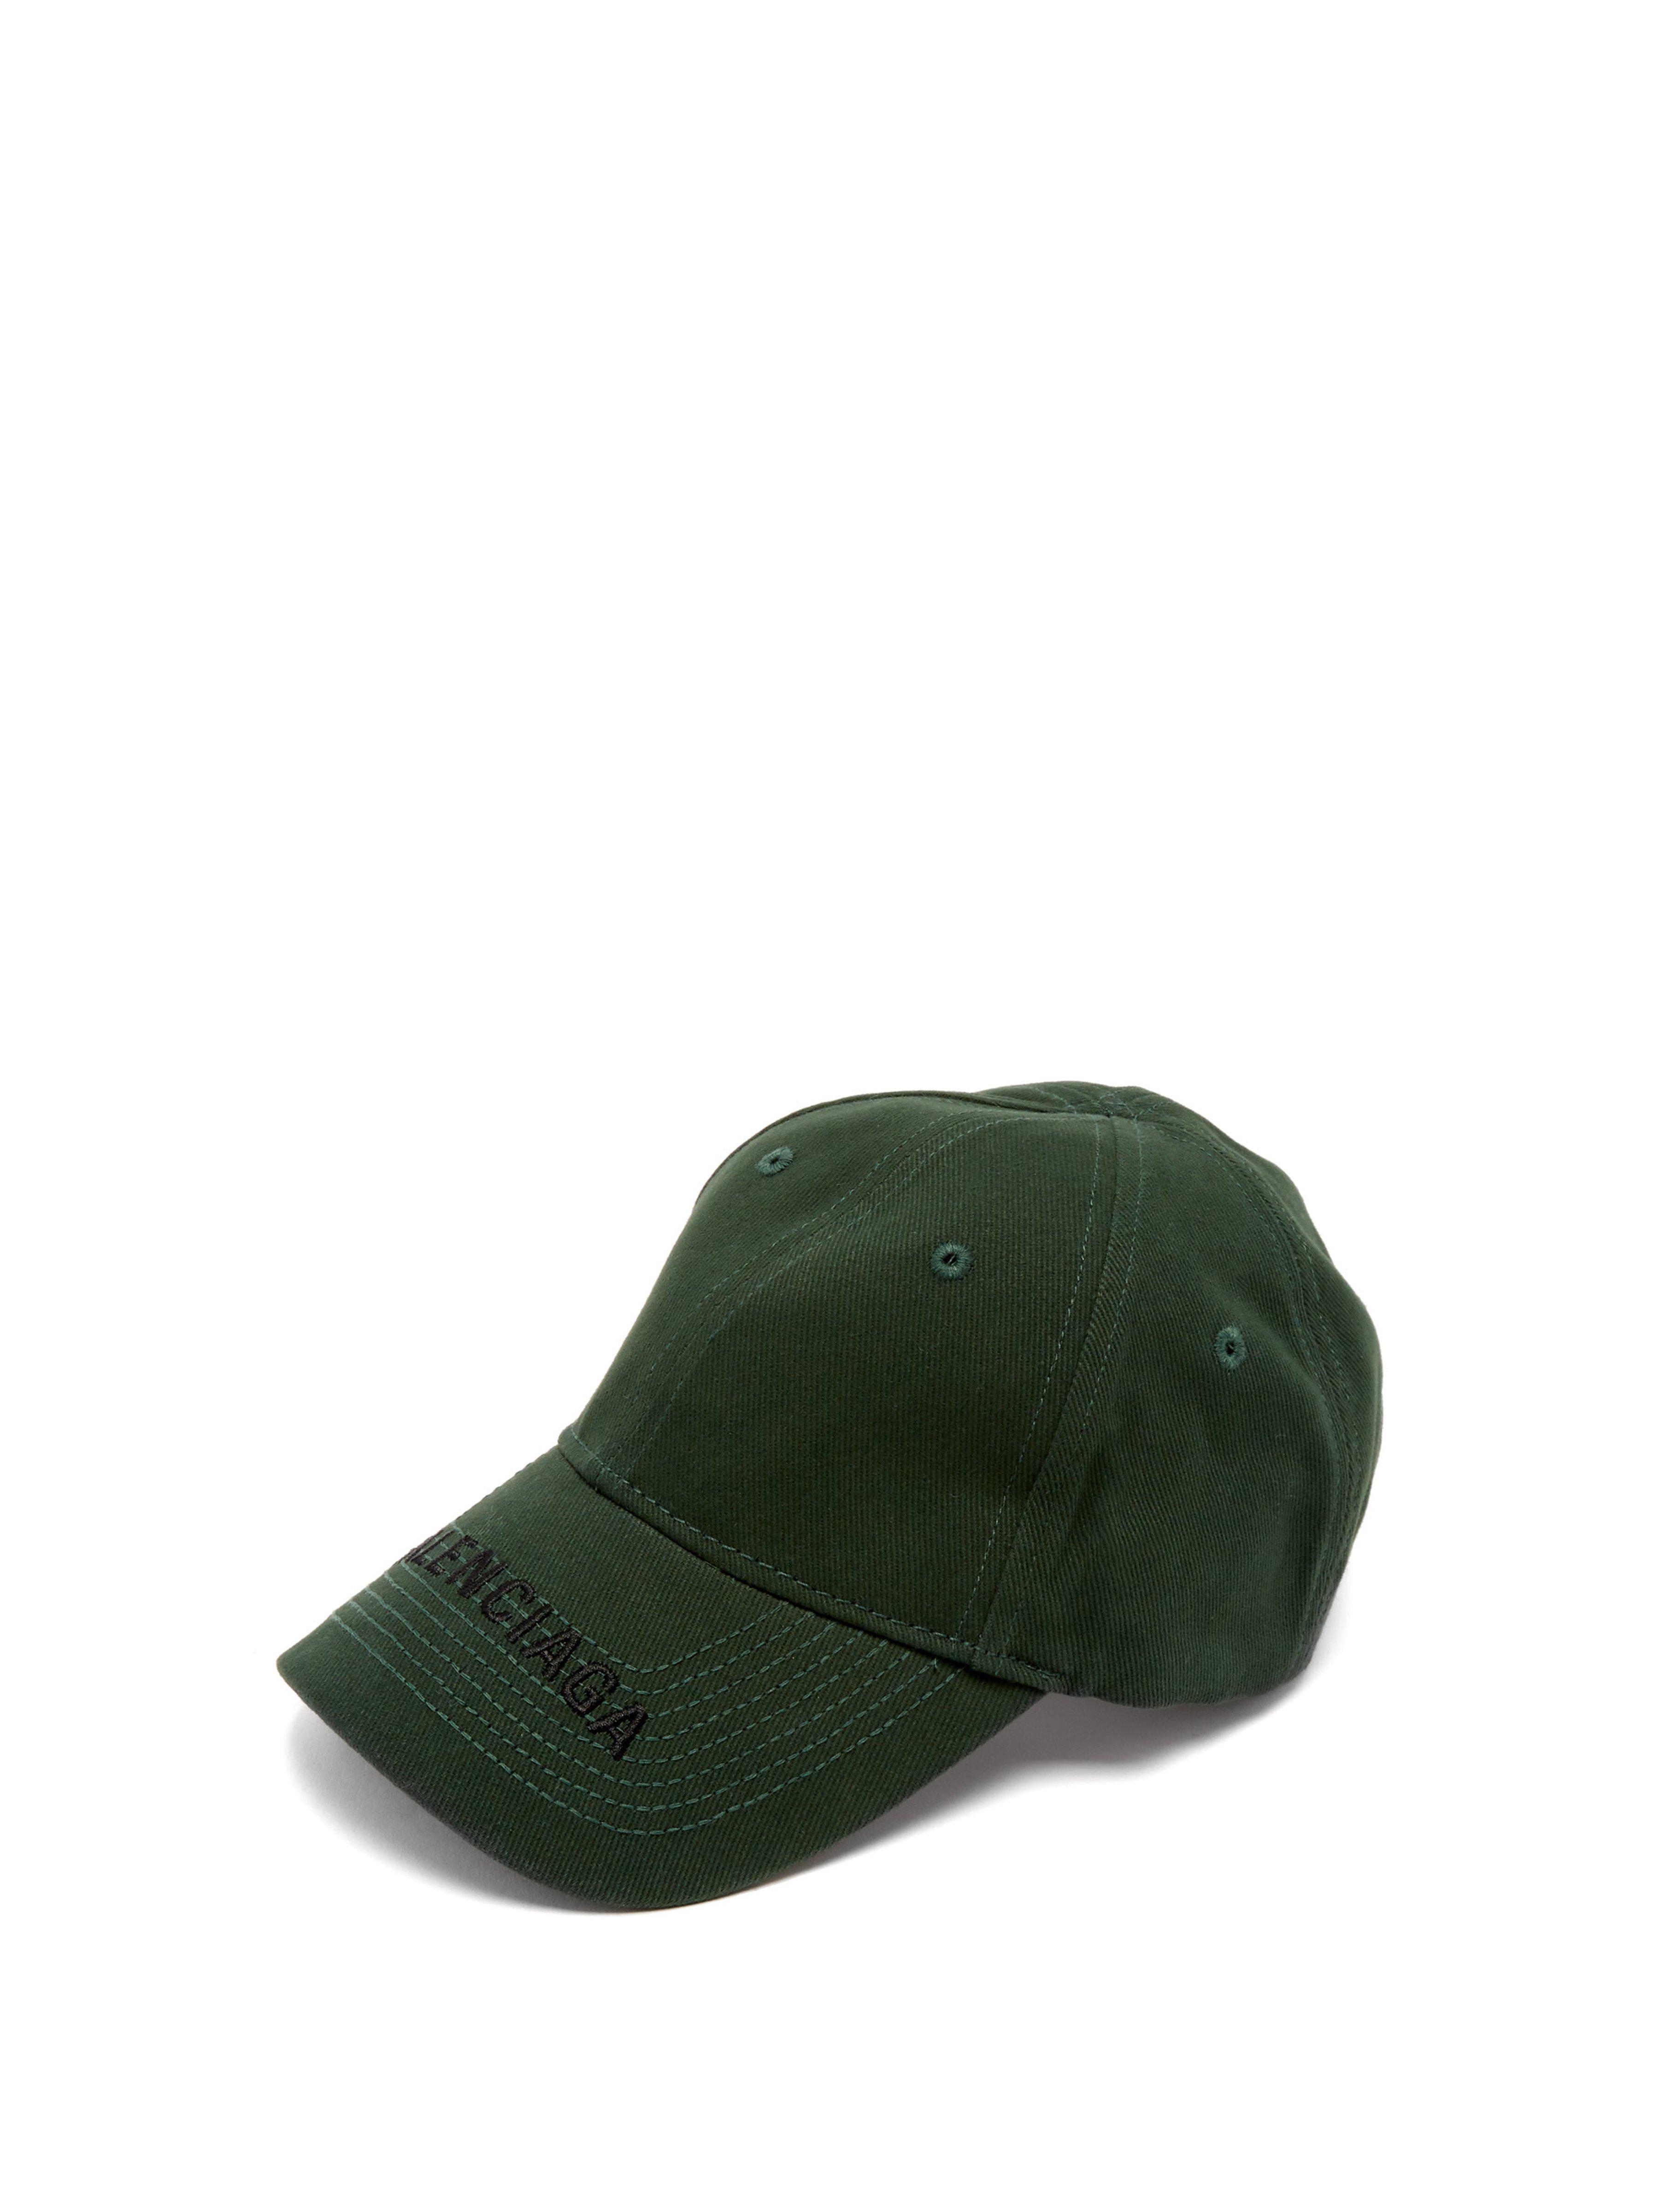 dbd2a5ad2198d6 Balenciaga Logo Embroidered Cotton Cap in Green - Lyst